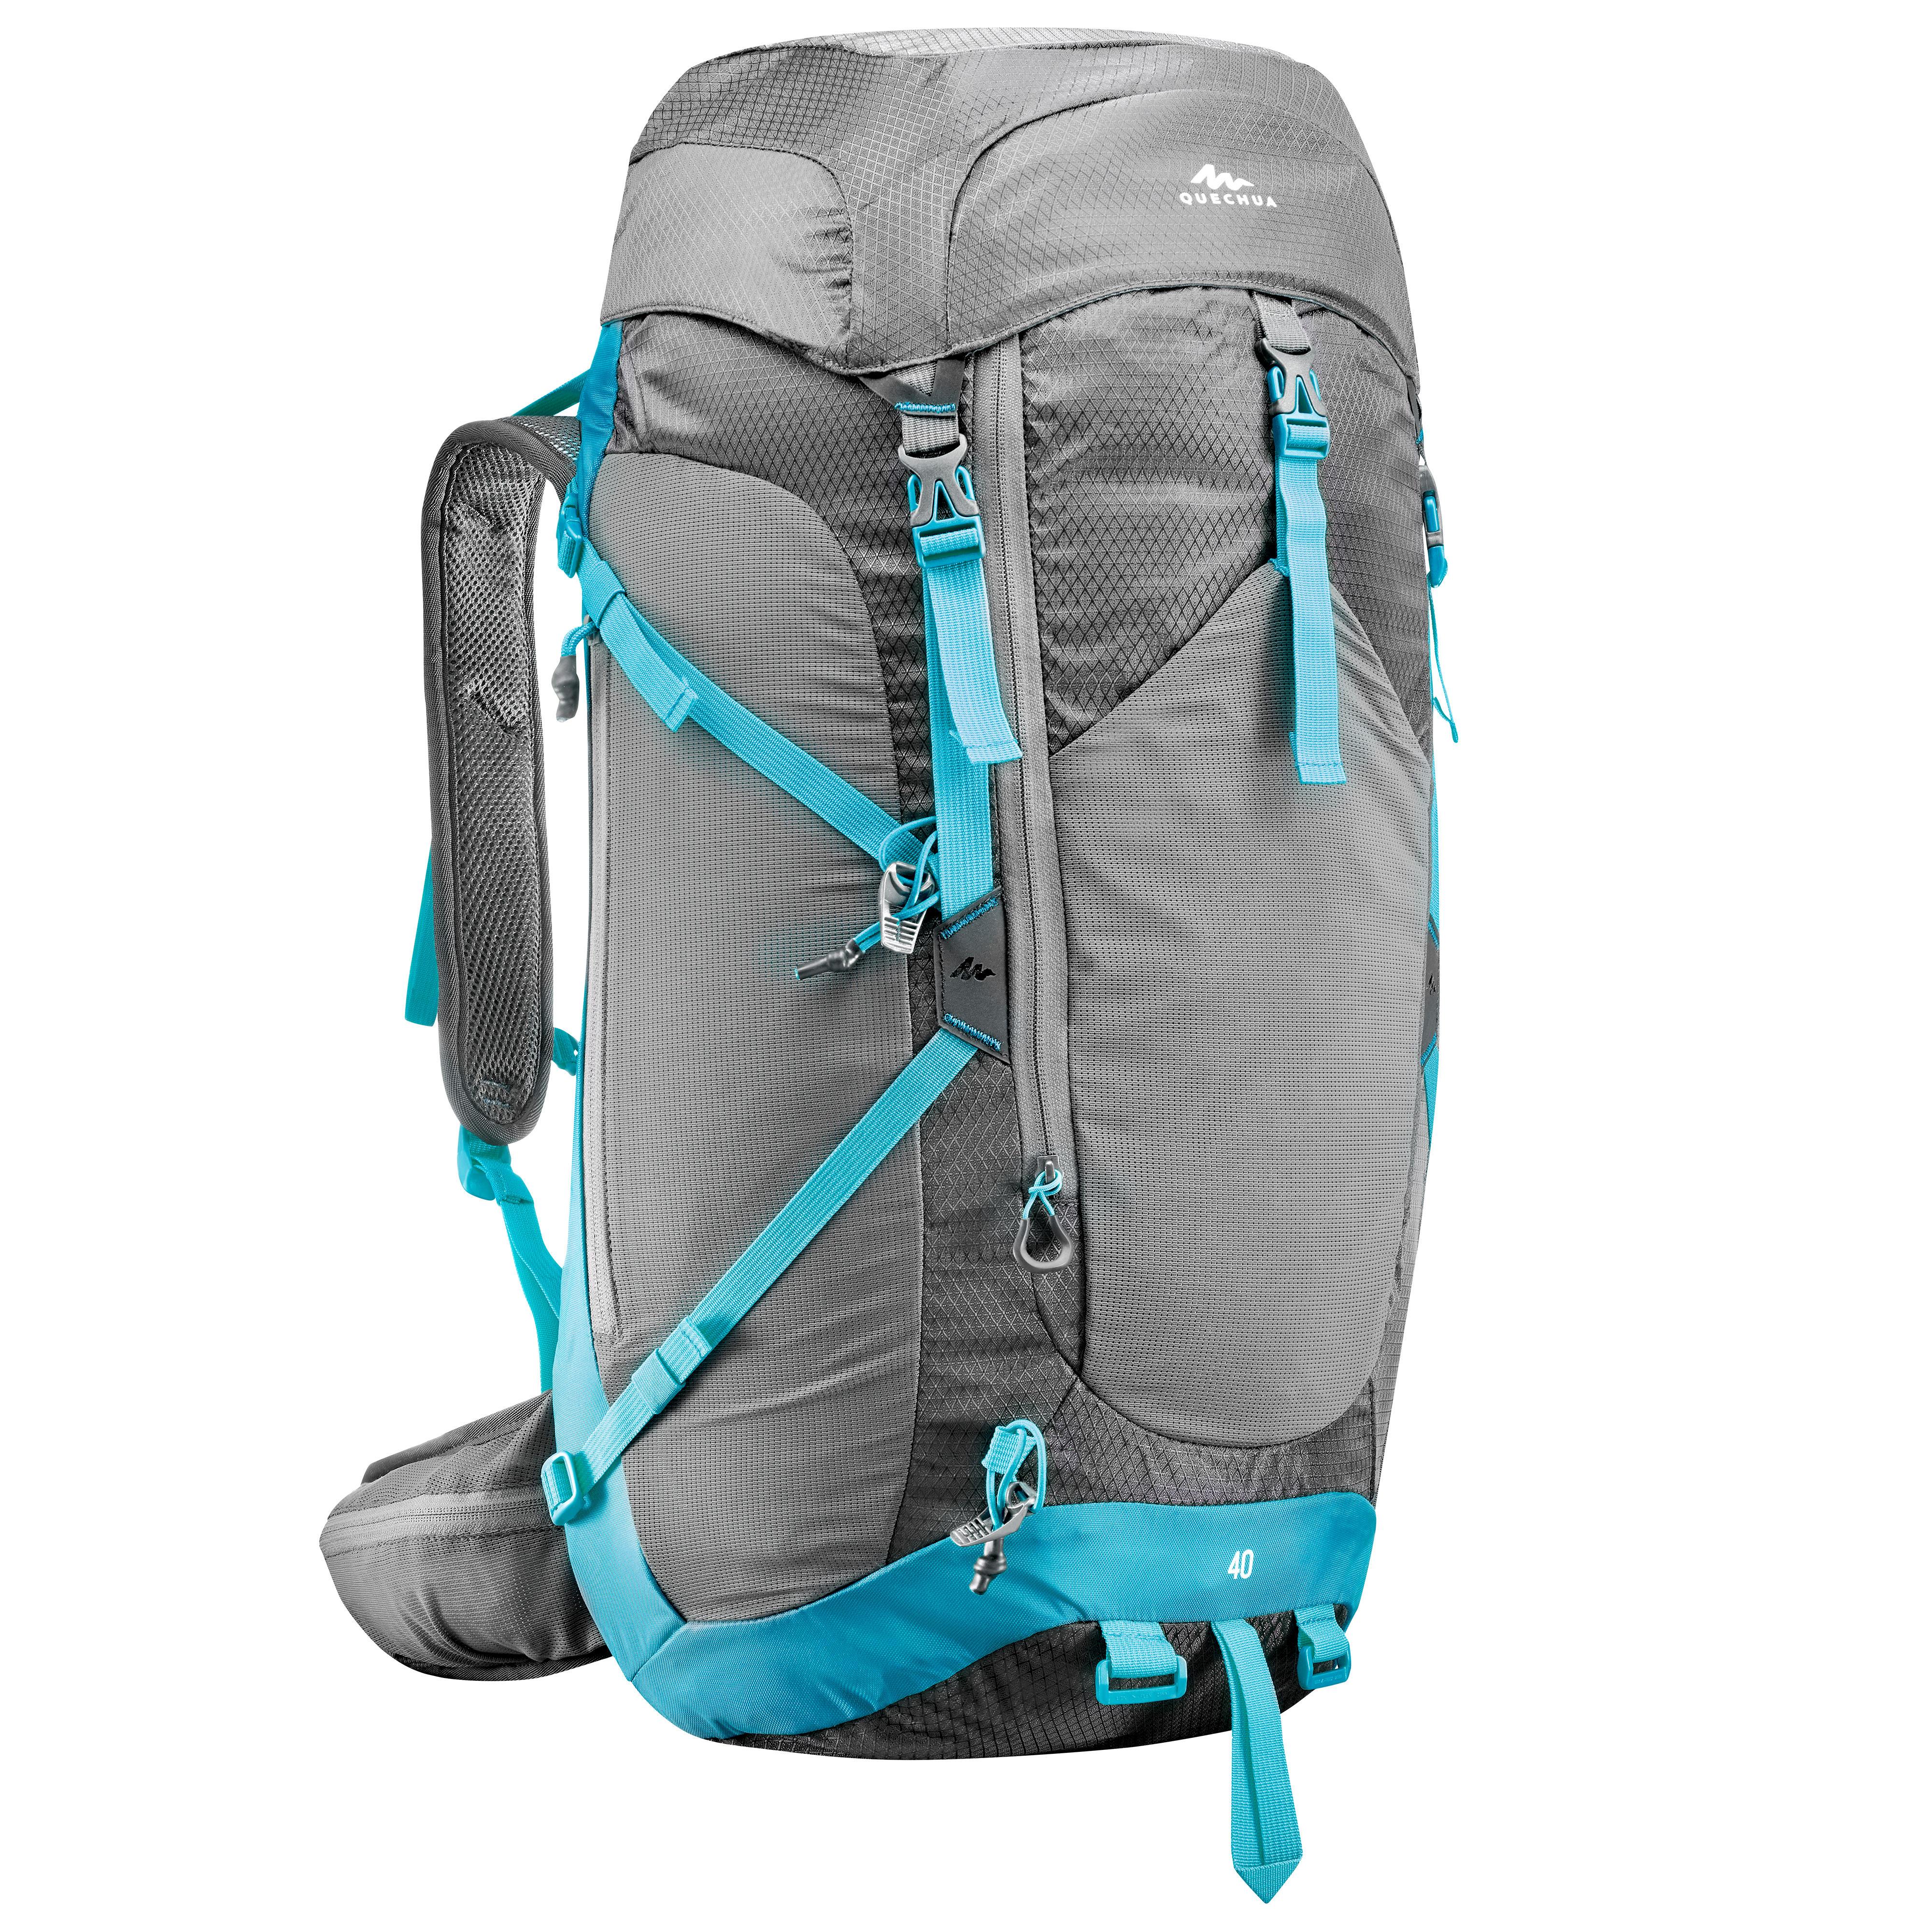 35fe45c69a9 Rugzak voor dames Forclaz Air+ 40 liter grijs-blauw